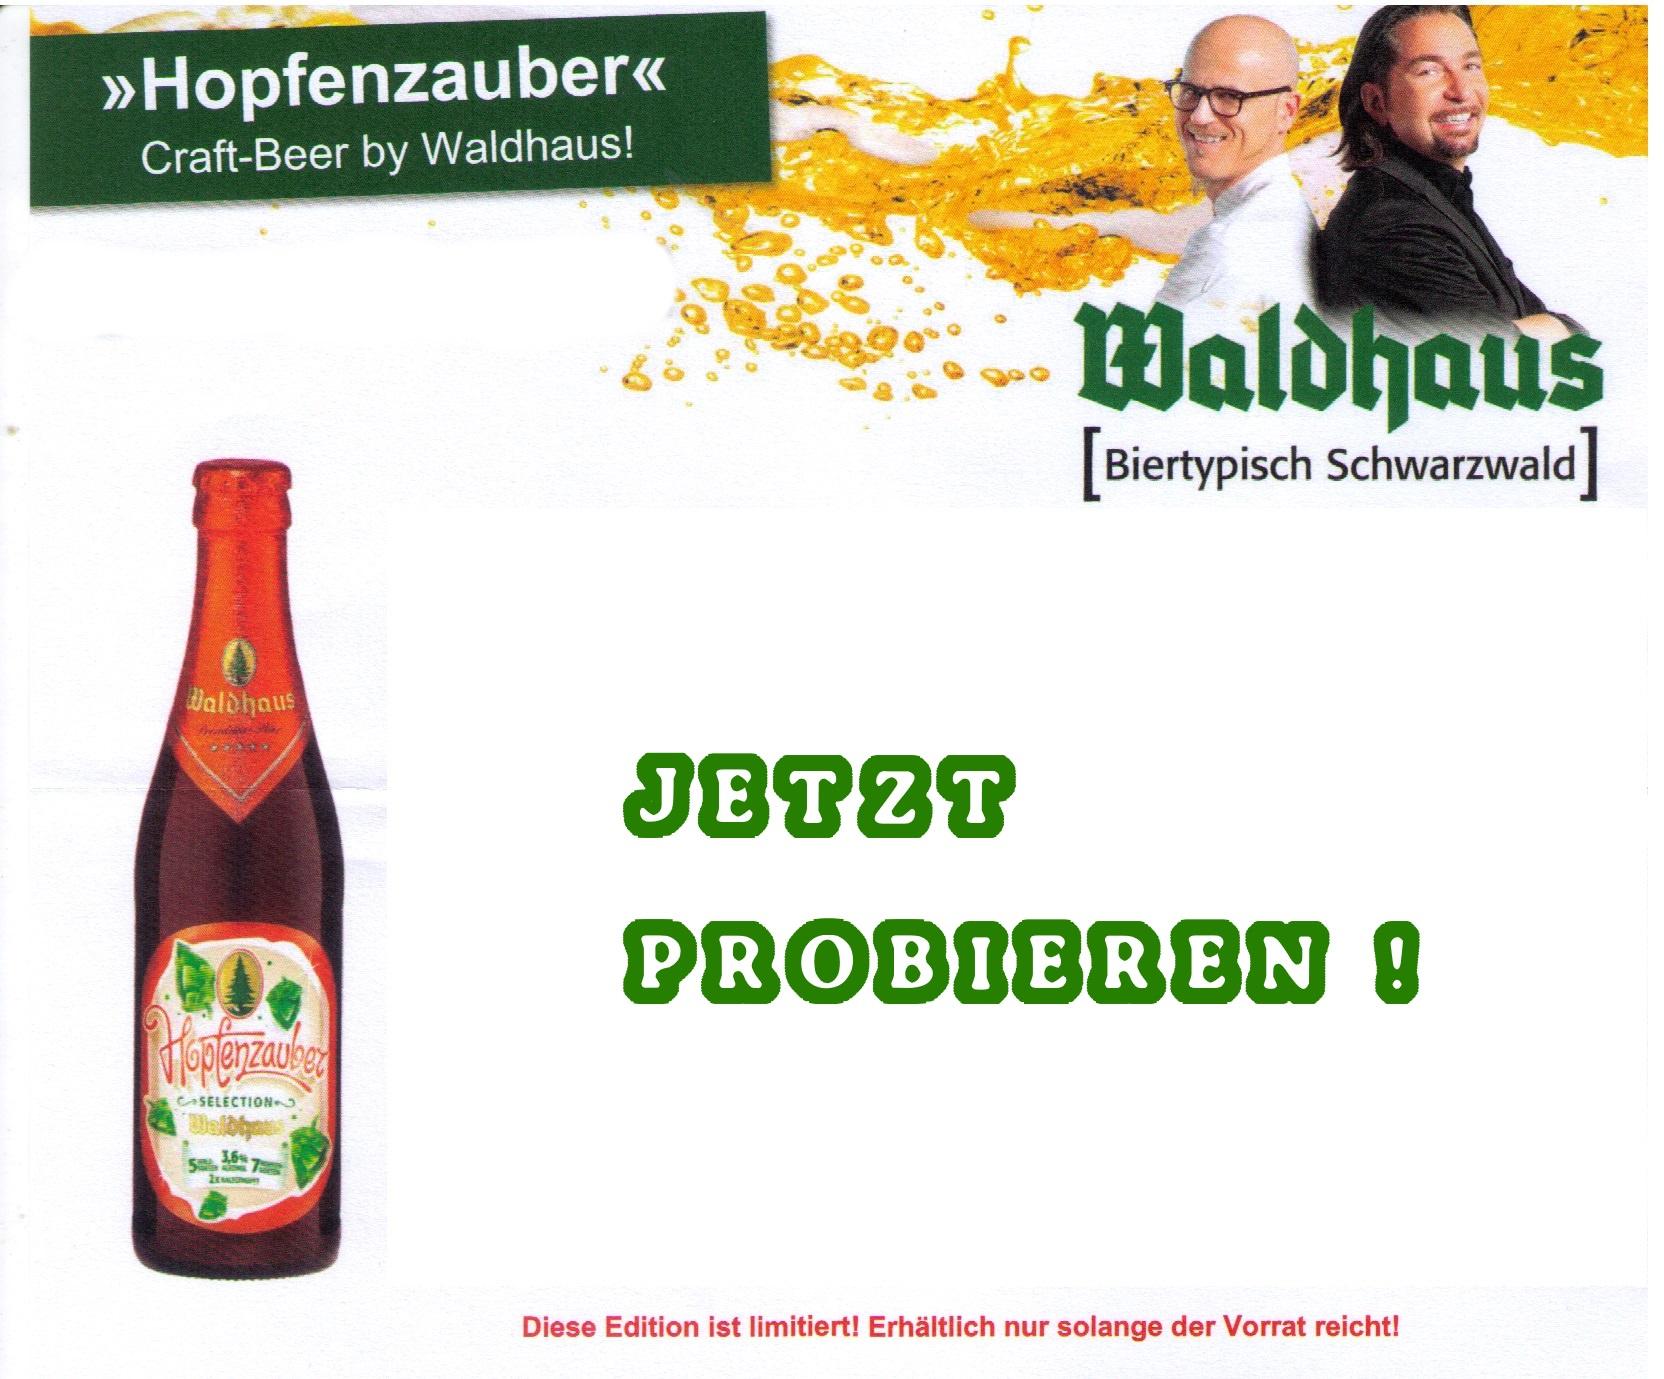 Waldhaus Hopfenzauber Craft-Beer